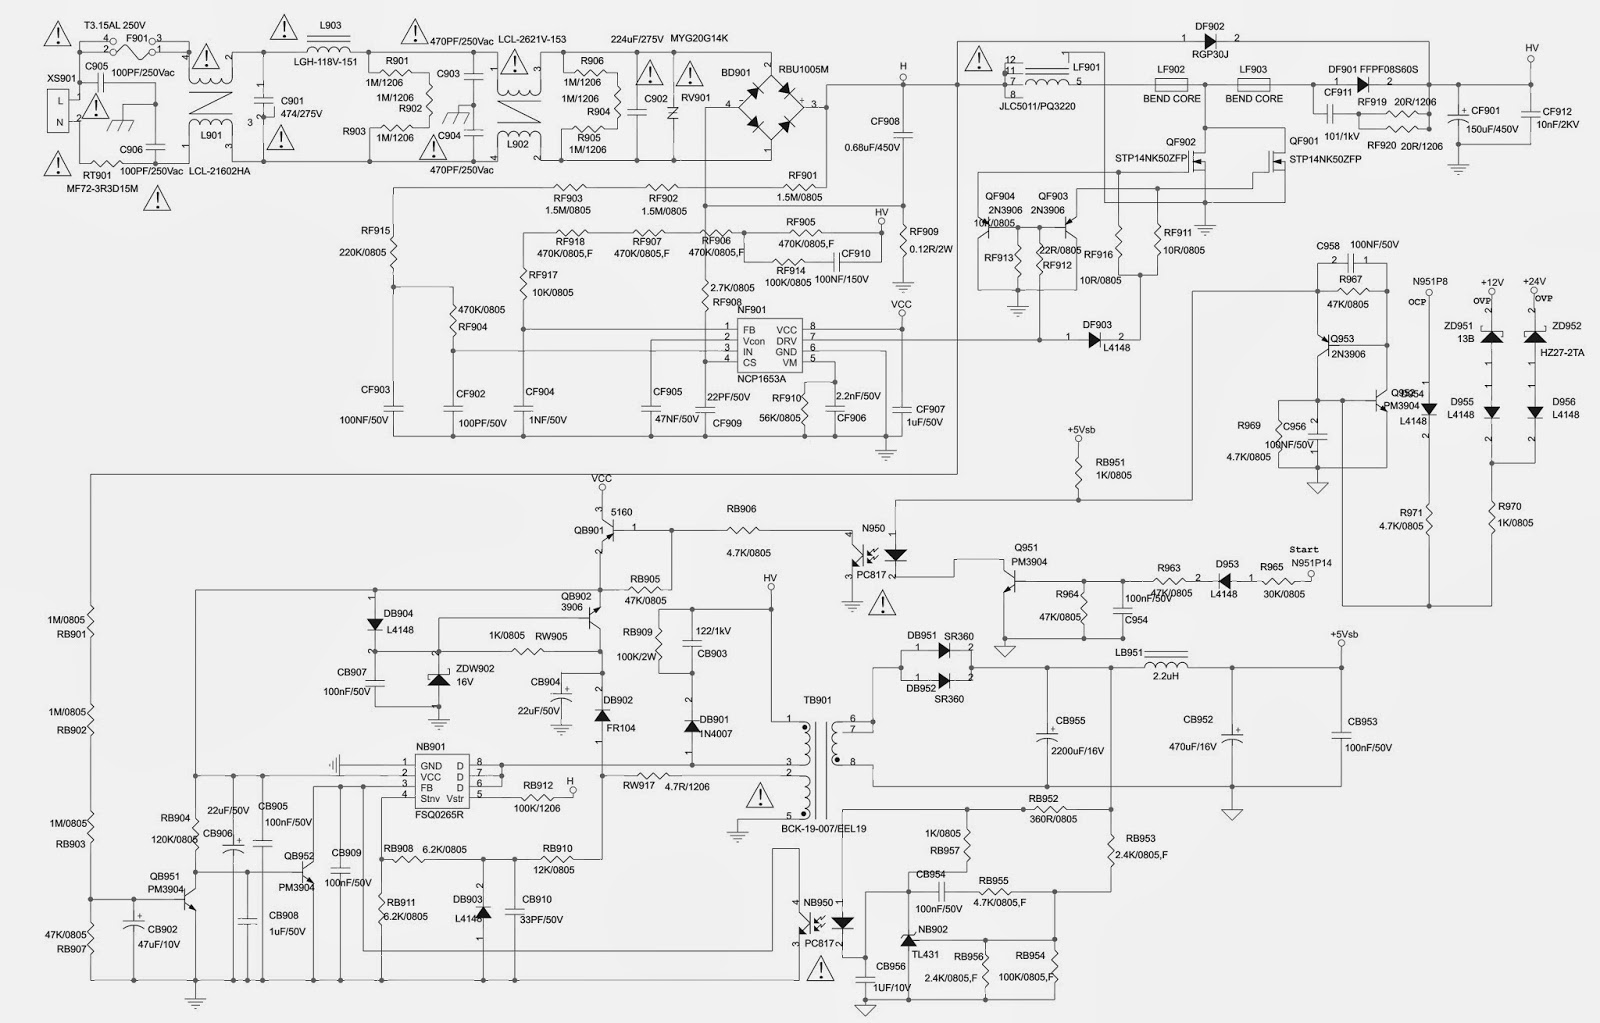 toshiba xv550xv600da lcd tv power supply schematic circuit diagram toshiba tv wiring diagram toshiba tv wiring diagrams [ 1600 x 1023 Pixel ]